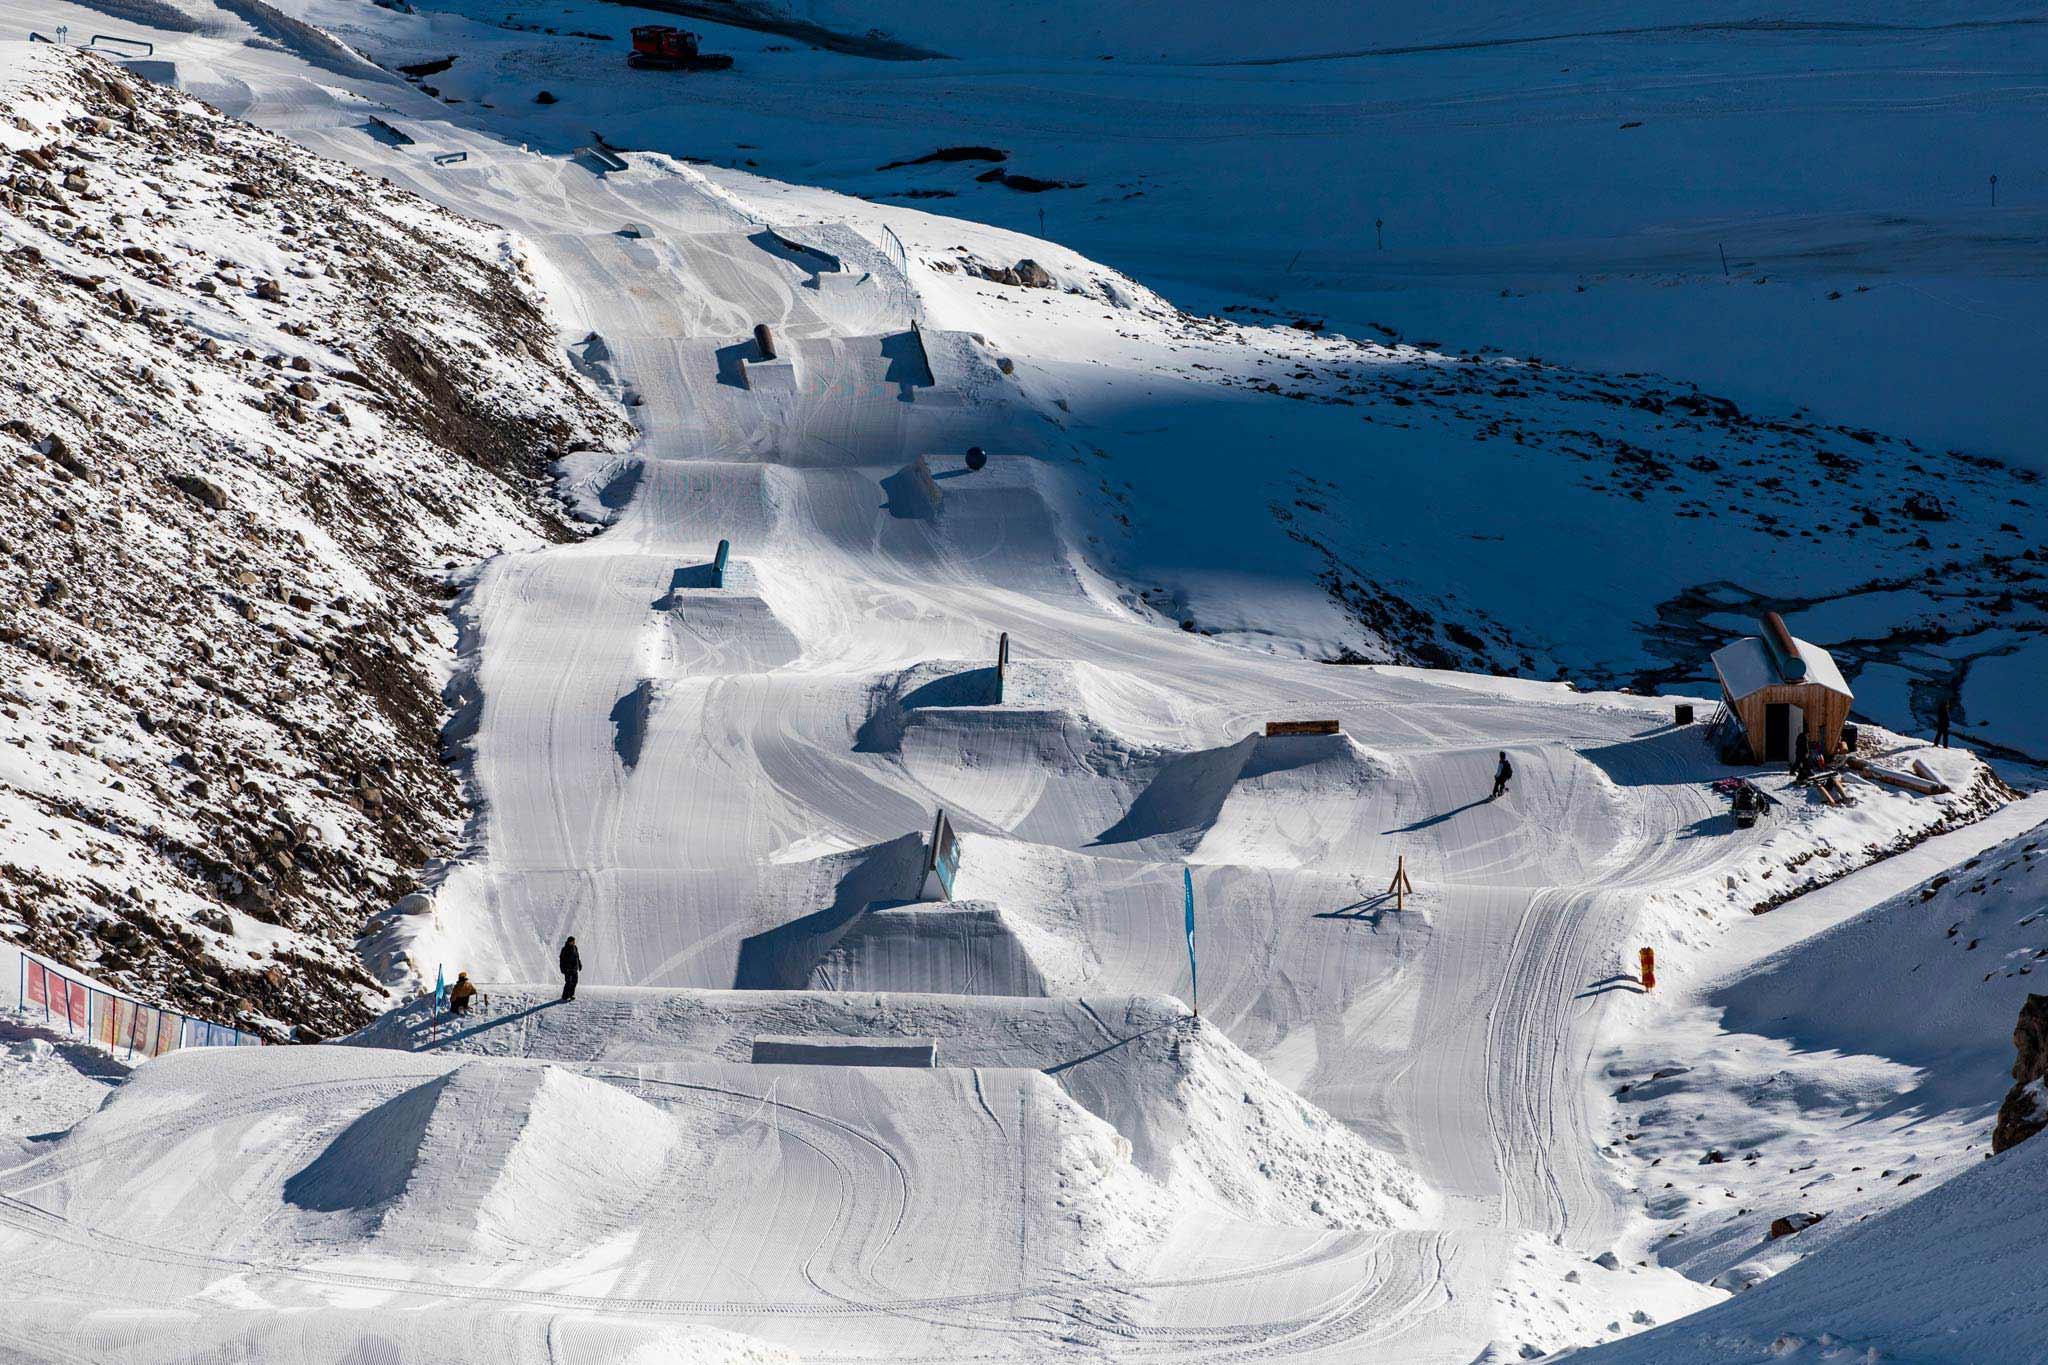 Ab sofort bis Anfang Dezember geöffnet: Der Snowpark Kaunertal! - Foto: Felix Pirker